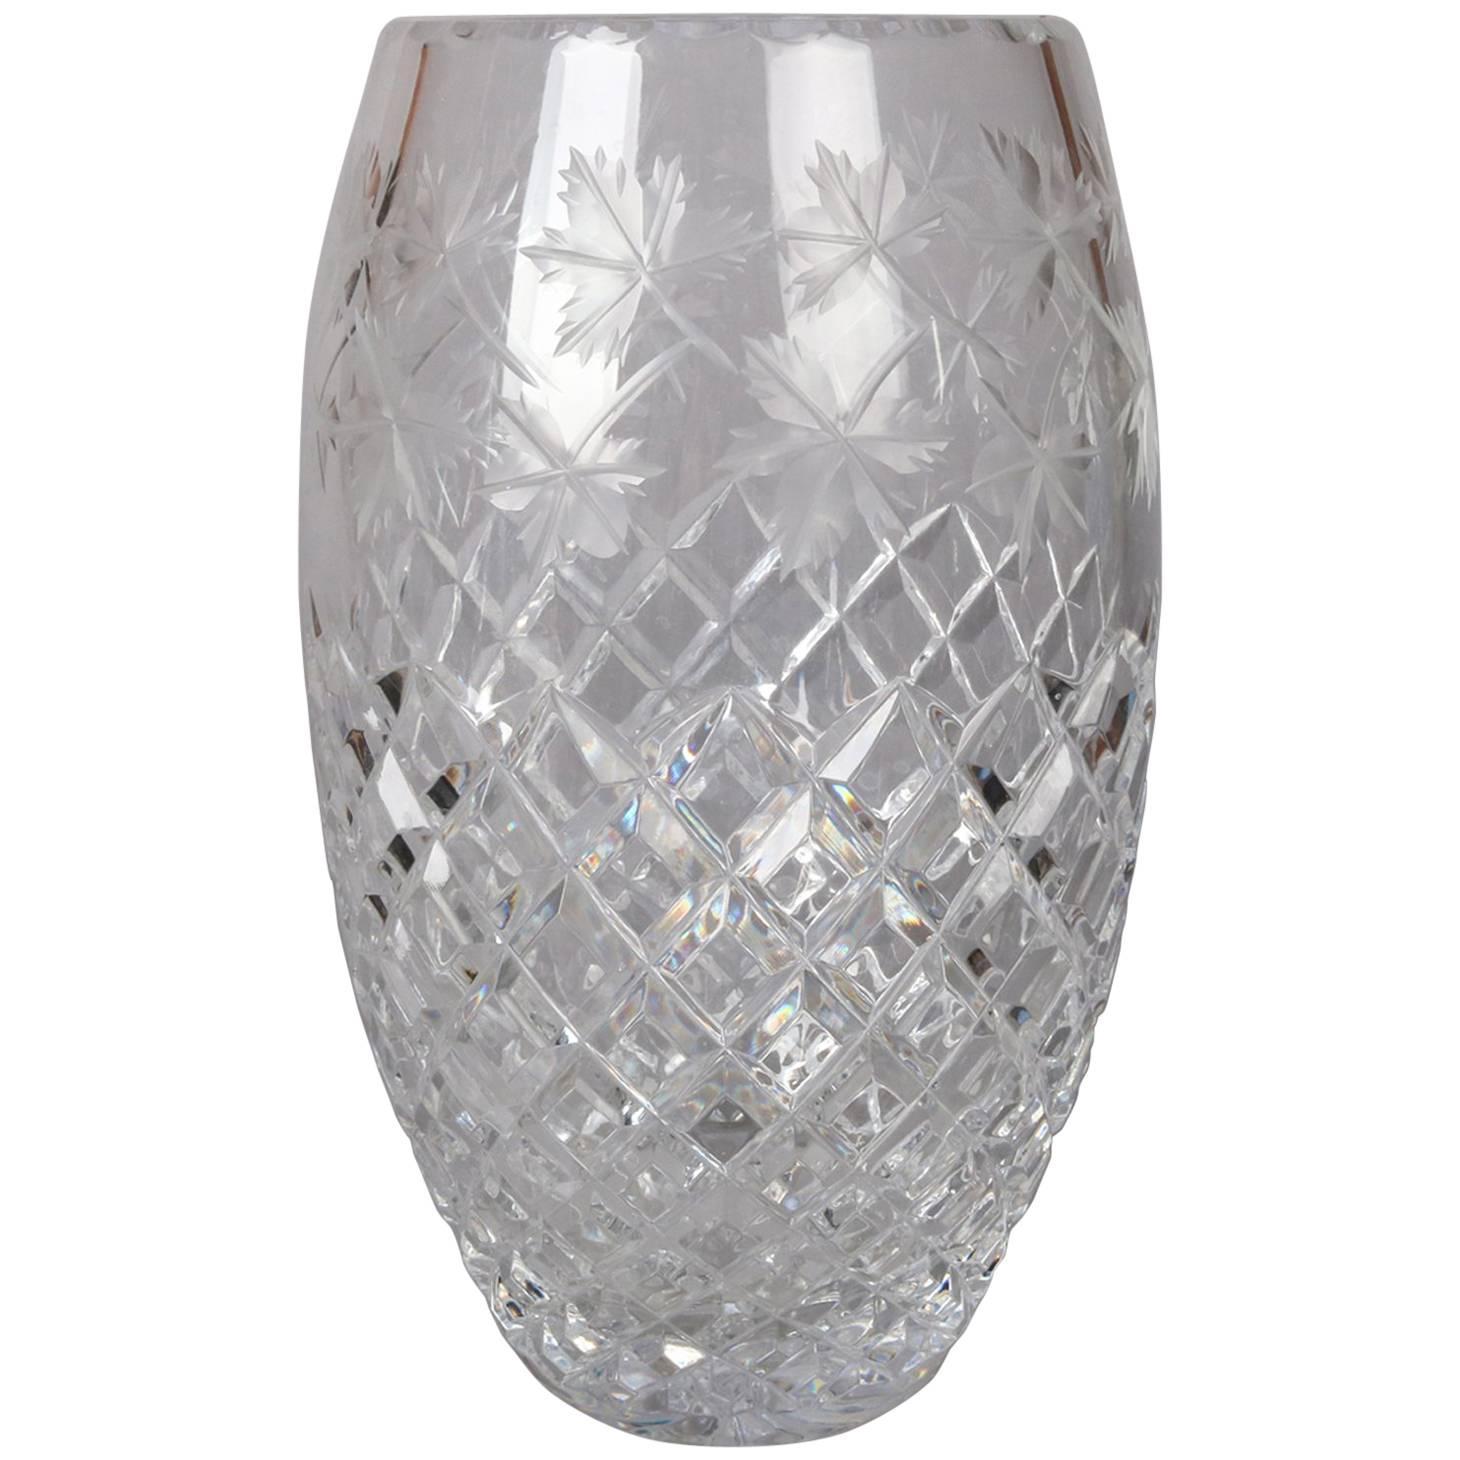 Antique Hawkes School Brilliant Cut Crystal Maple Leaf Vase, 20th Century